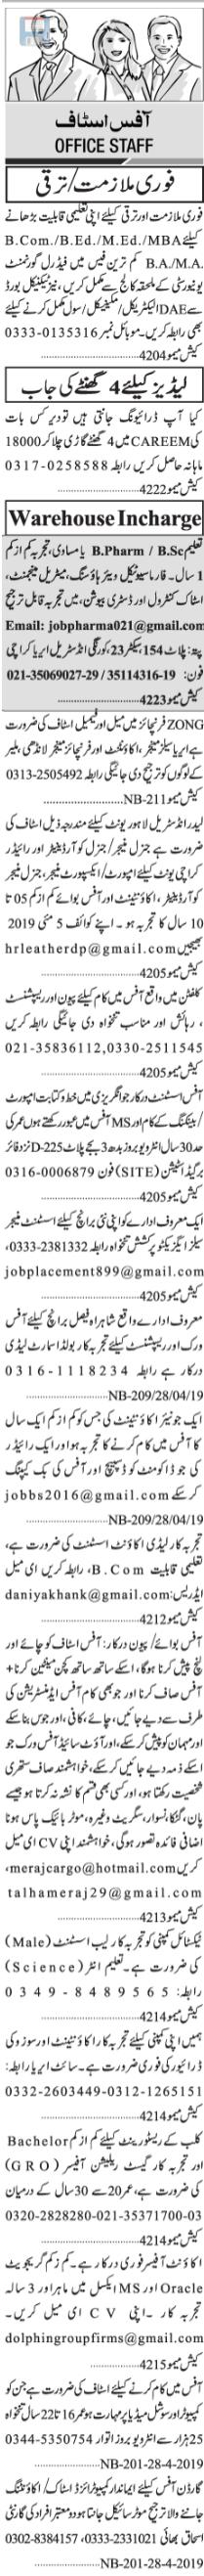 Daily Jang 12 May Miscellaneous Staff Jobs 2019 in Karachi